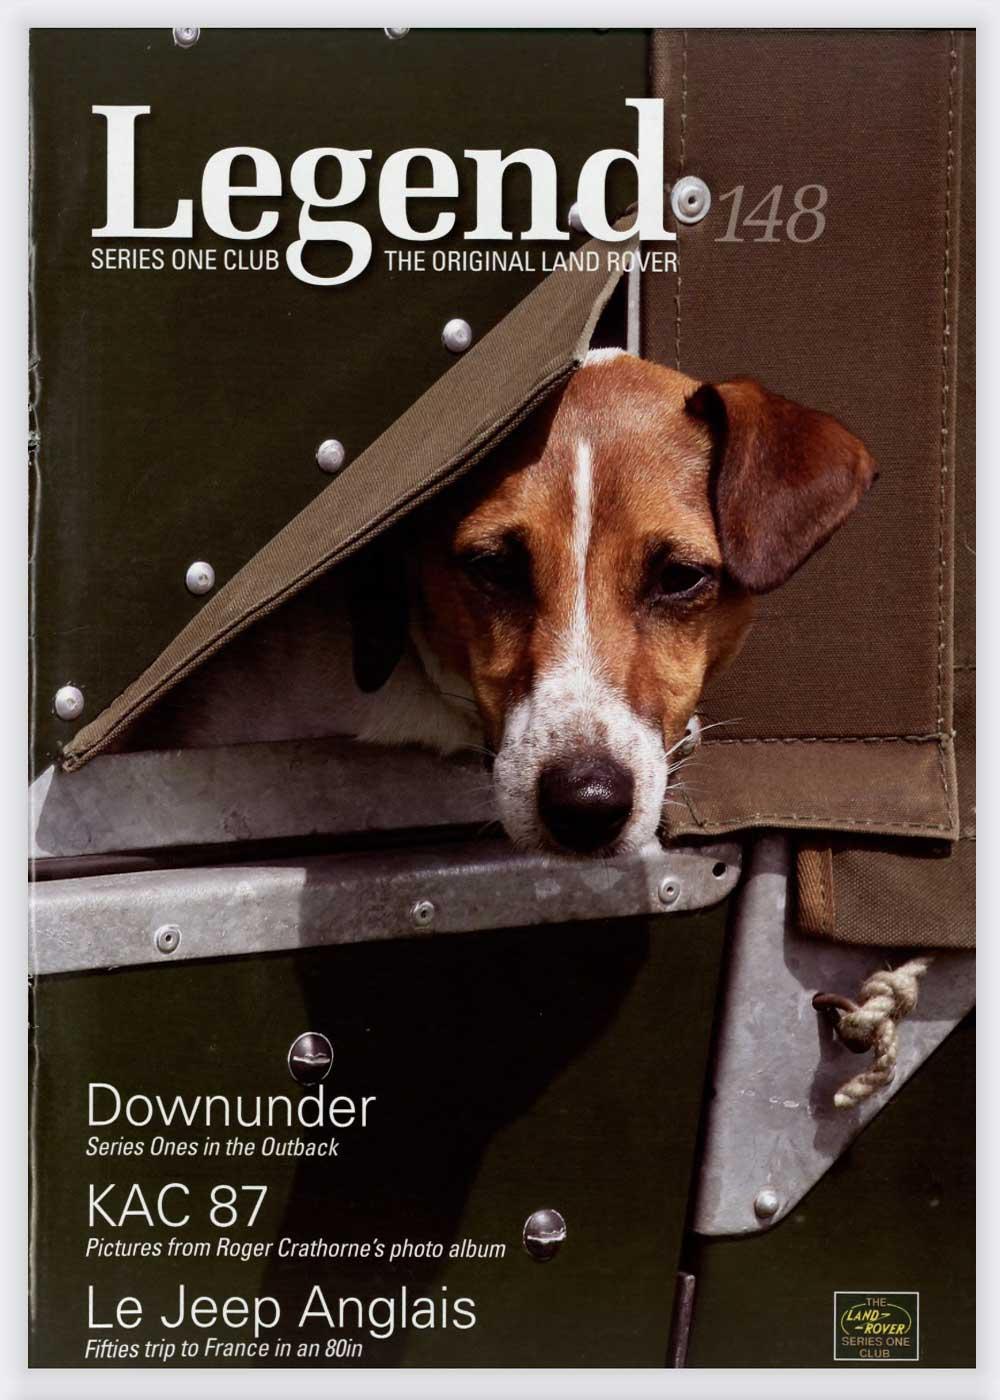 https://www.lrsoc.com/forum/index.php?page=legend